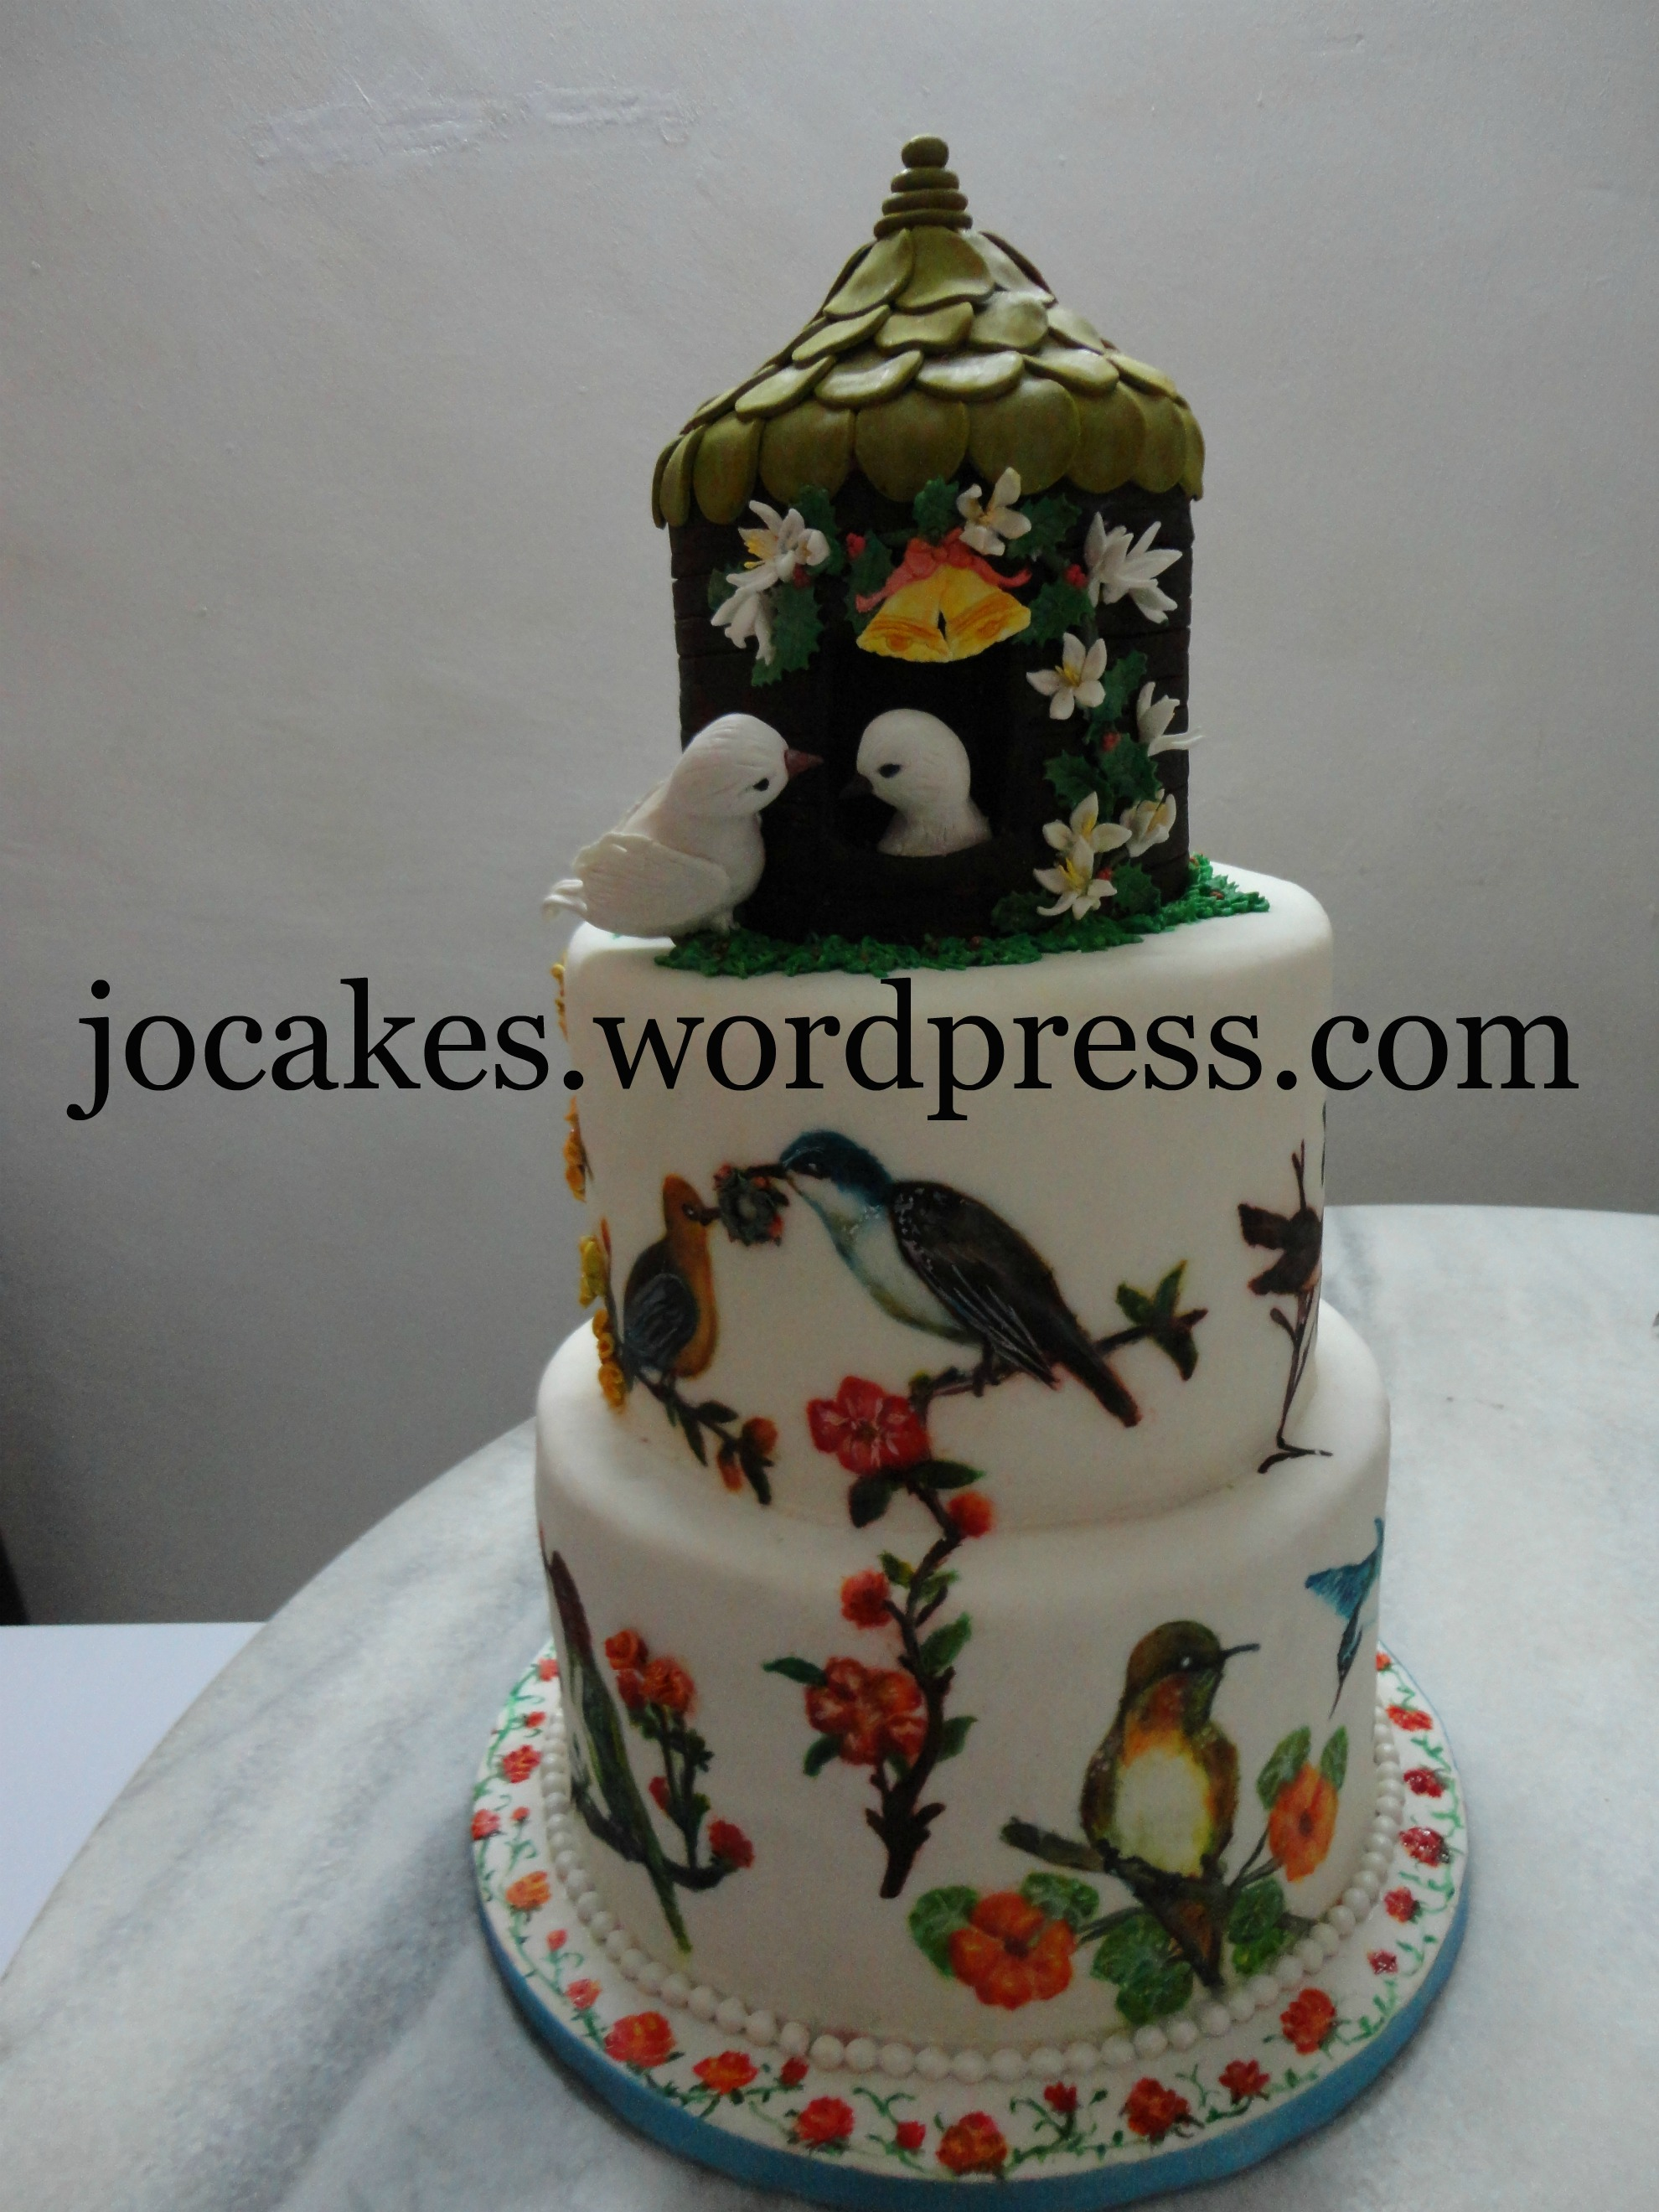 My Competition Cake Jocakes